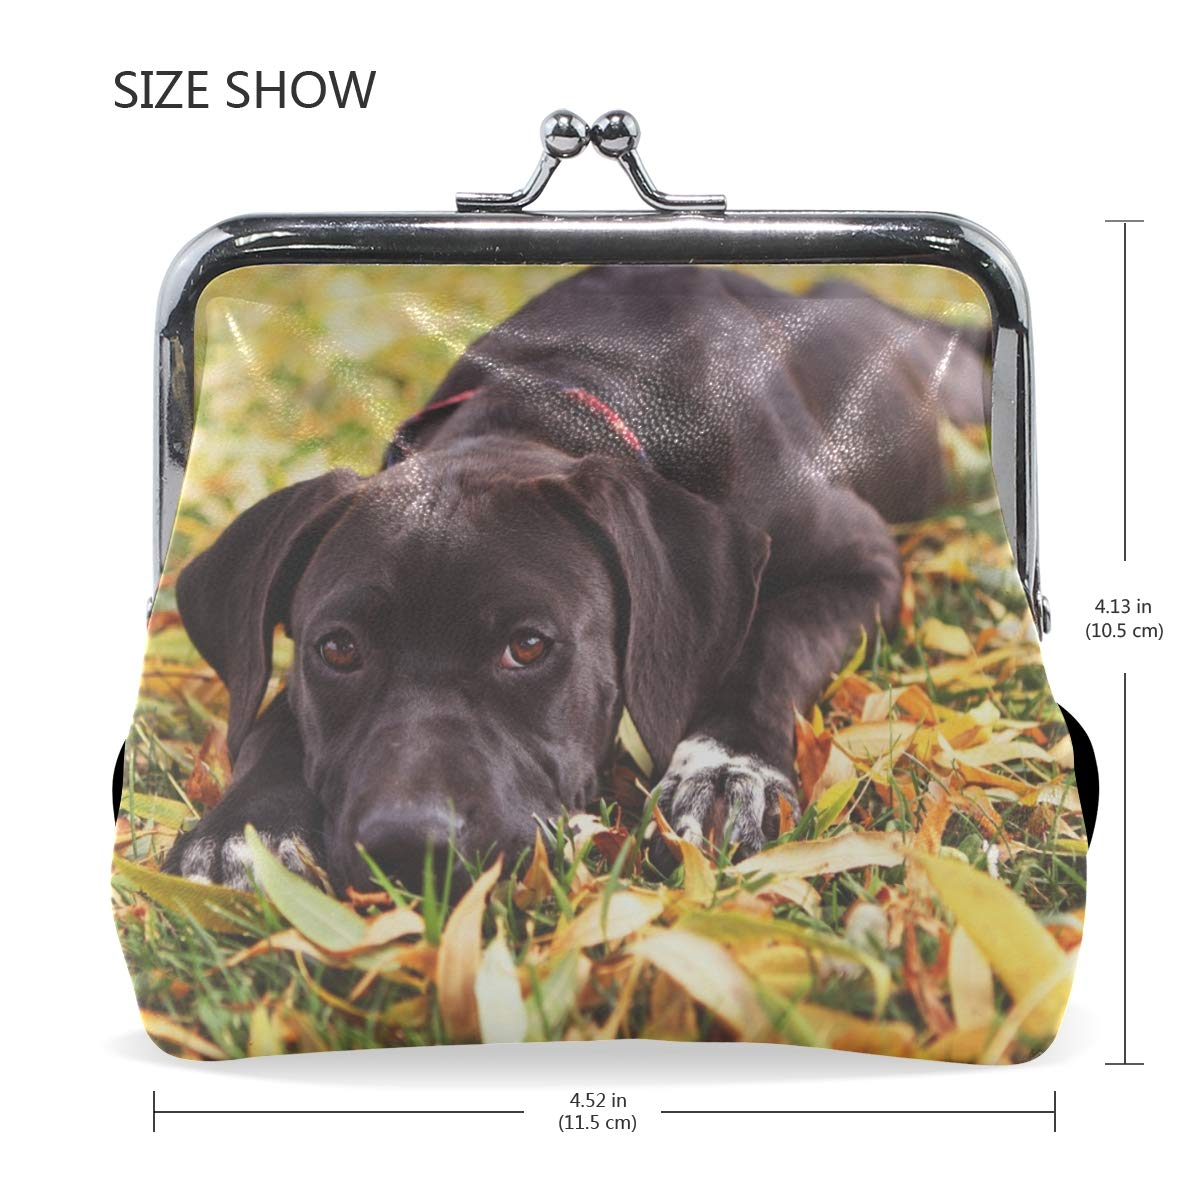 Rh Studio Coin Purse Clasp Closure Dog Retriever Face Grass Lie Print Wallet Exquisite Coin Pouch Girls Women Clutch Handbag Exquisite Gift